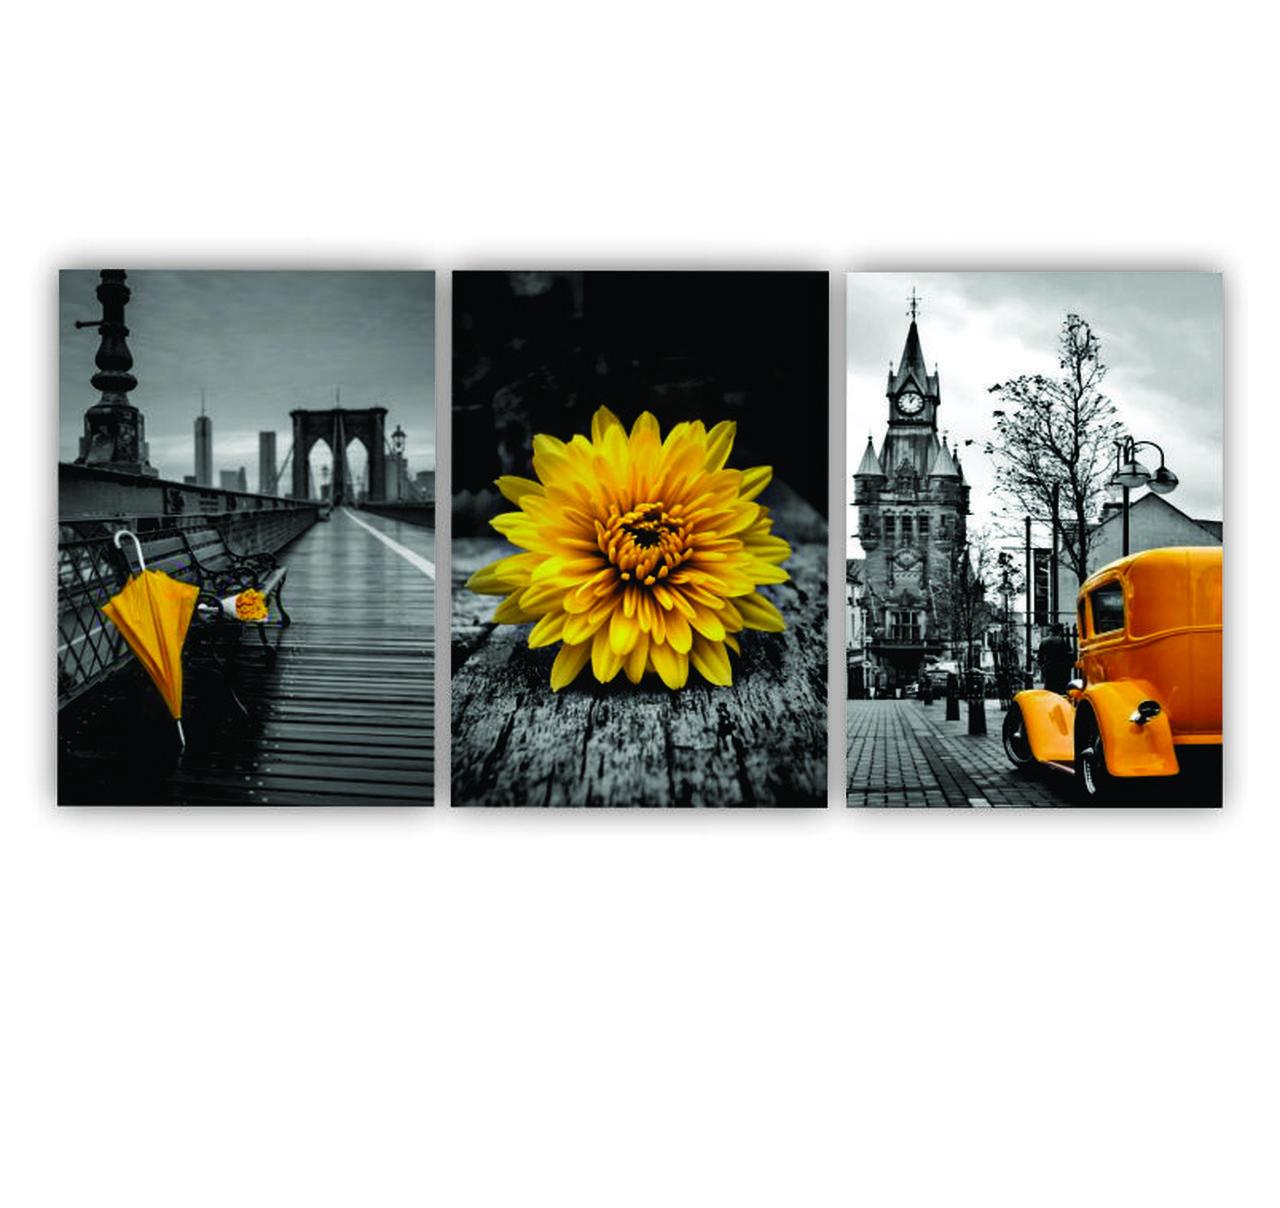 Quadro Pontos Turísticos Preto Branco e Amarelo - Kit 3 telas